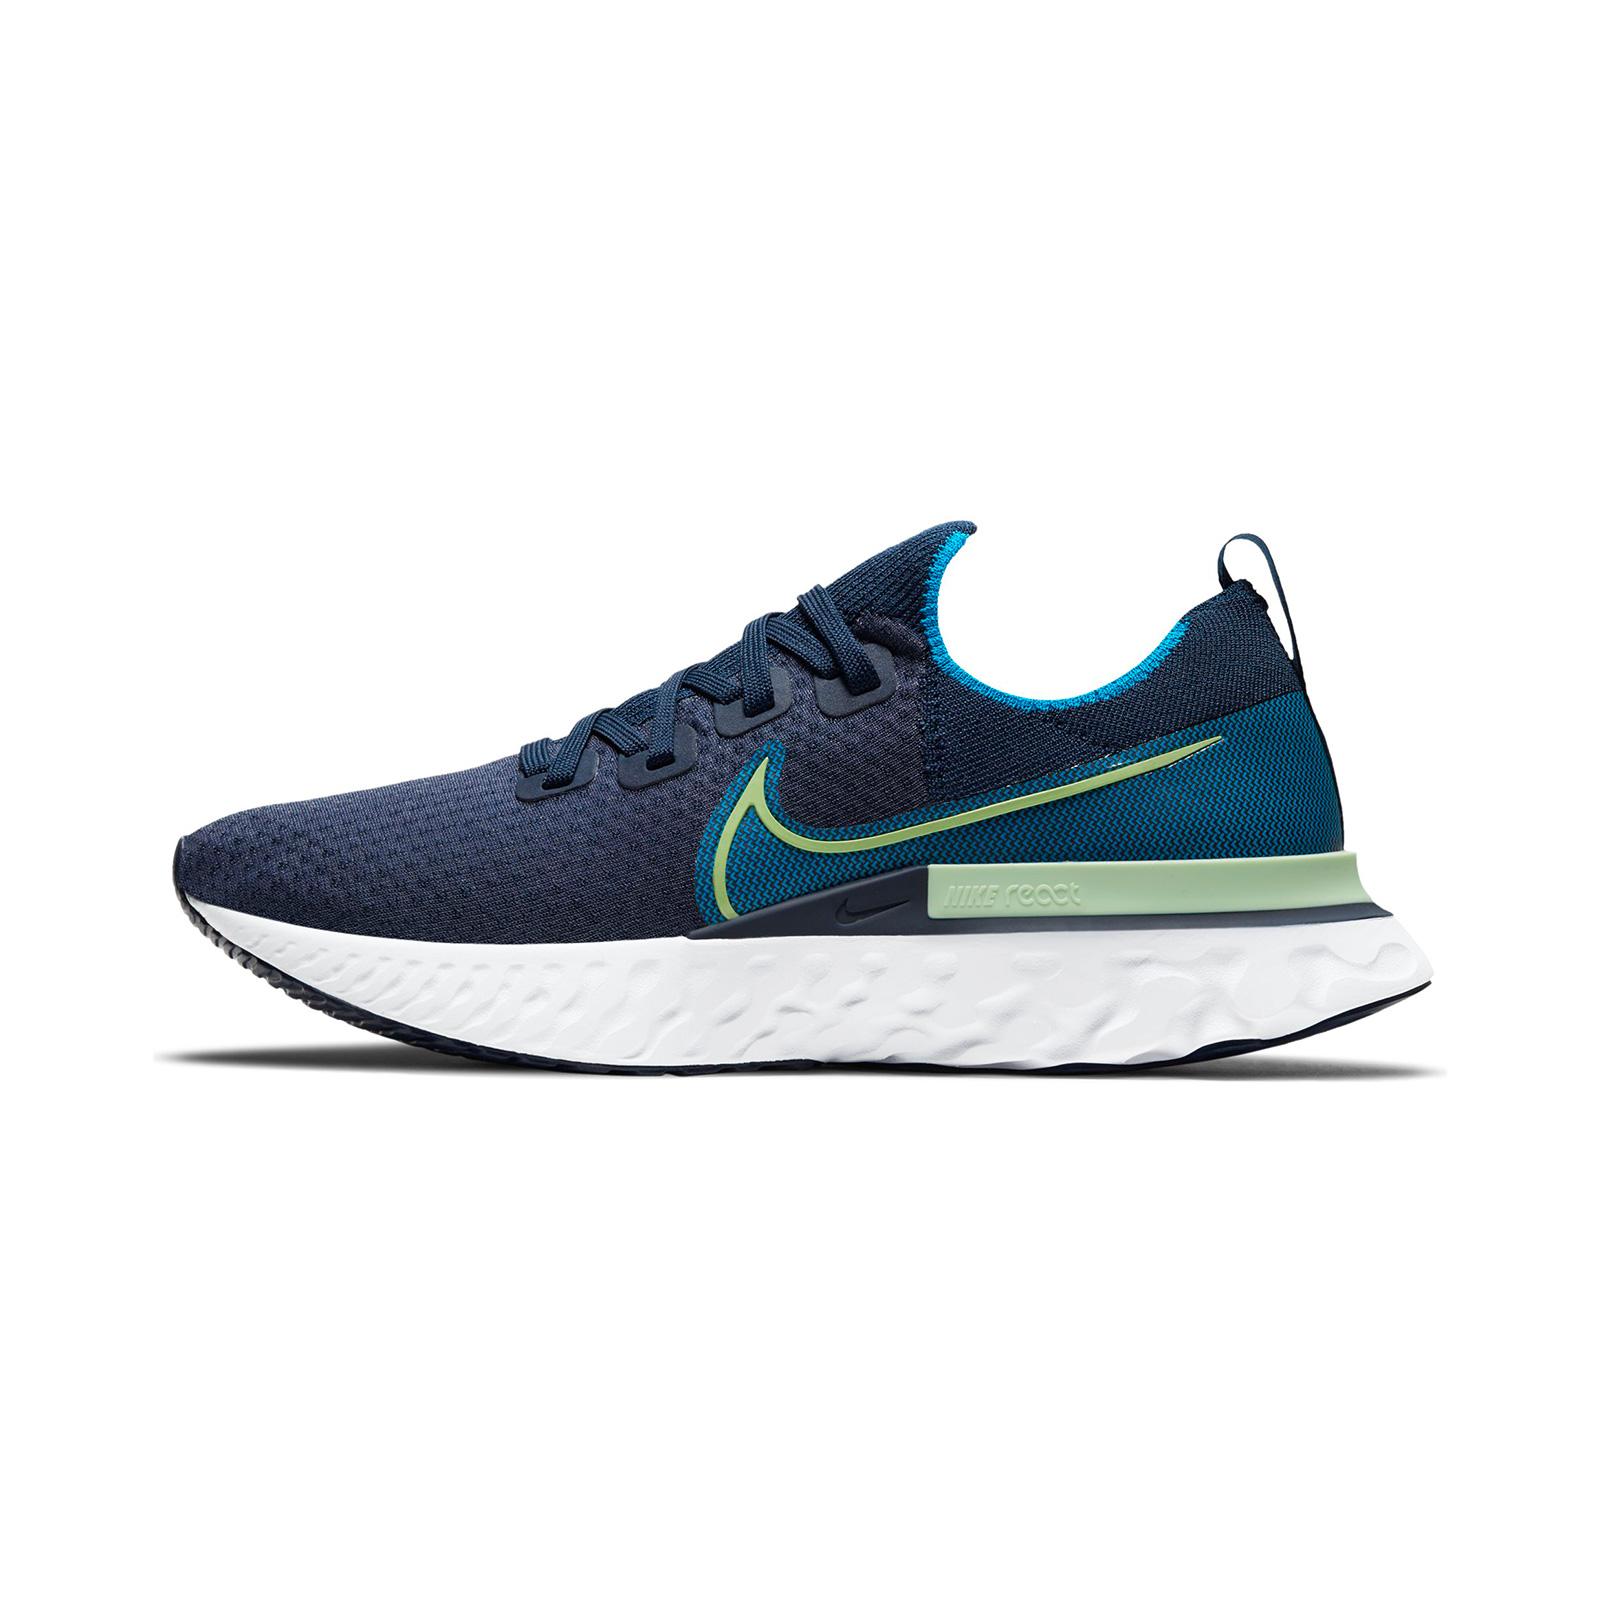 Nike React Infinity Run Flyknit 2 blue